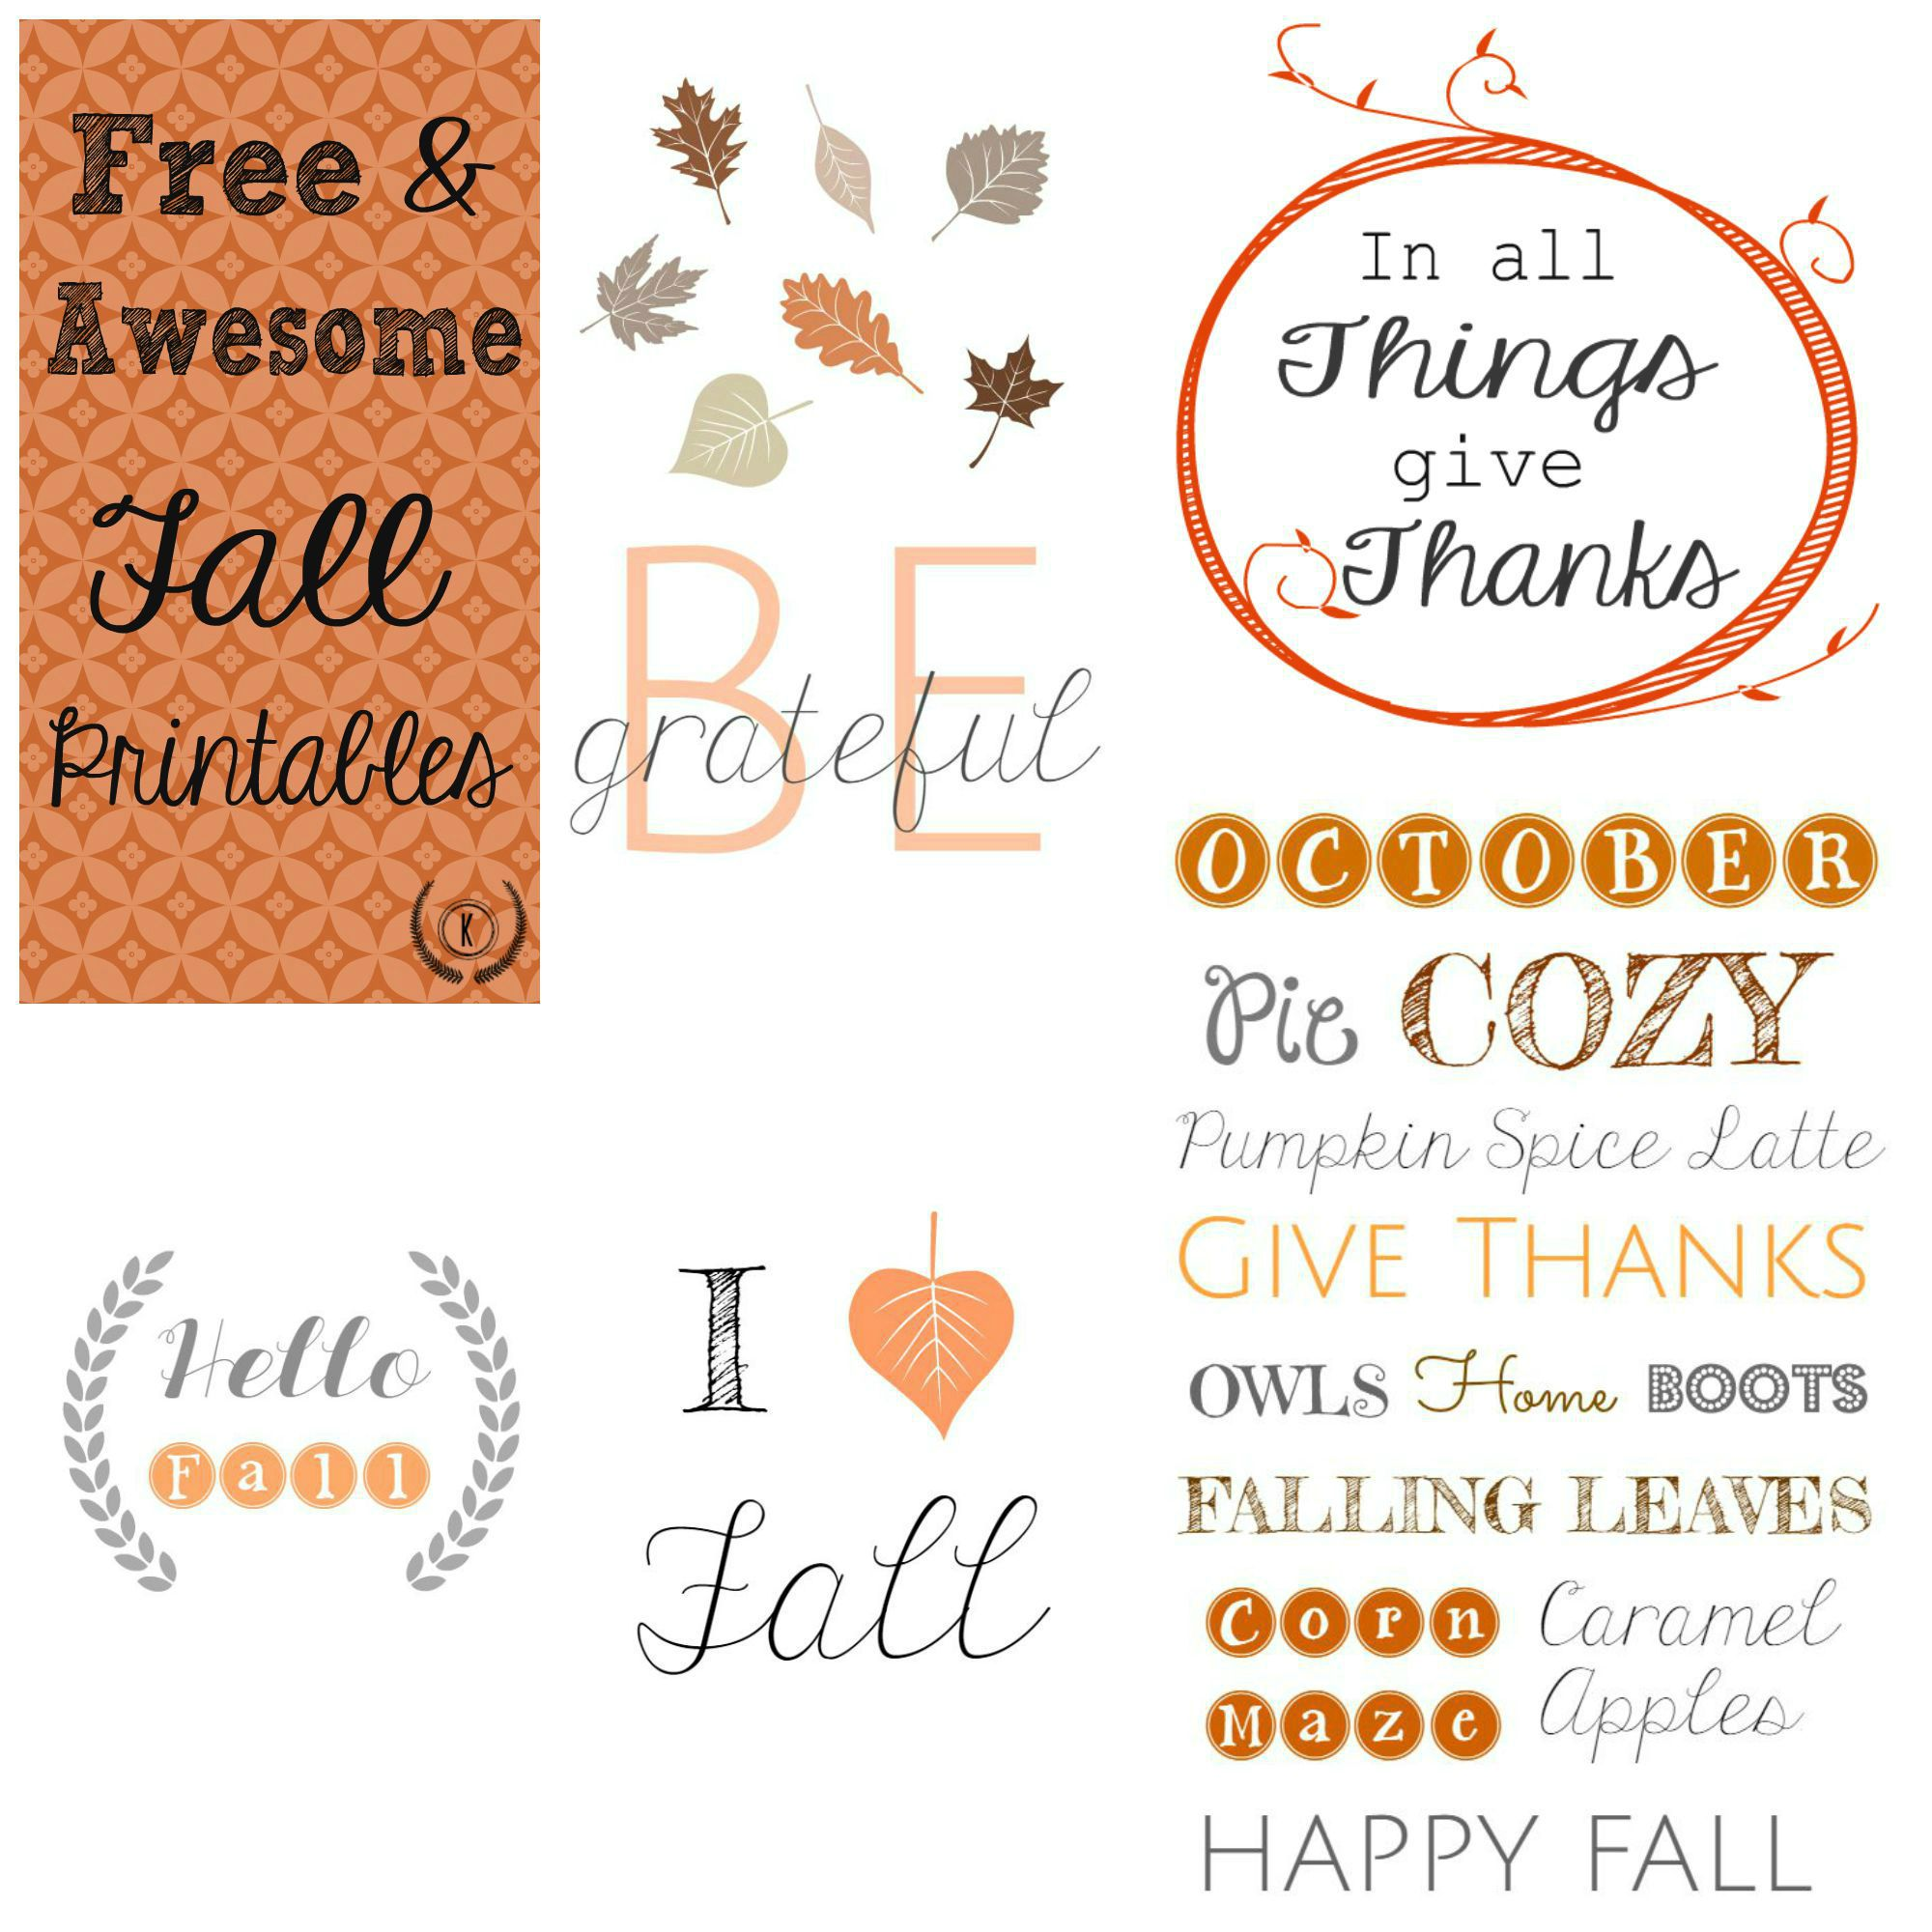 Free & Awesome Fall Printables |